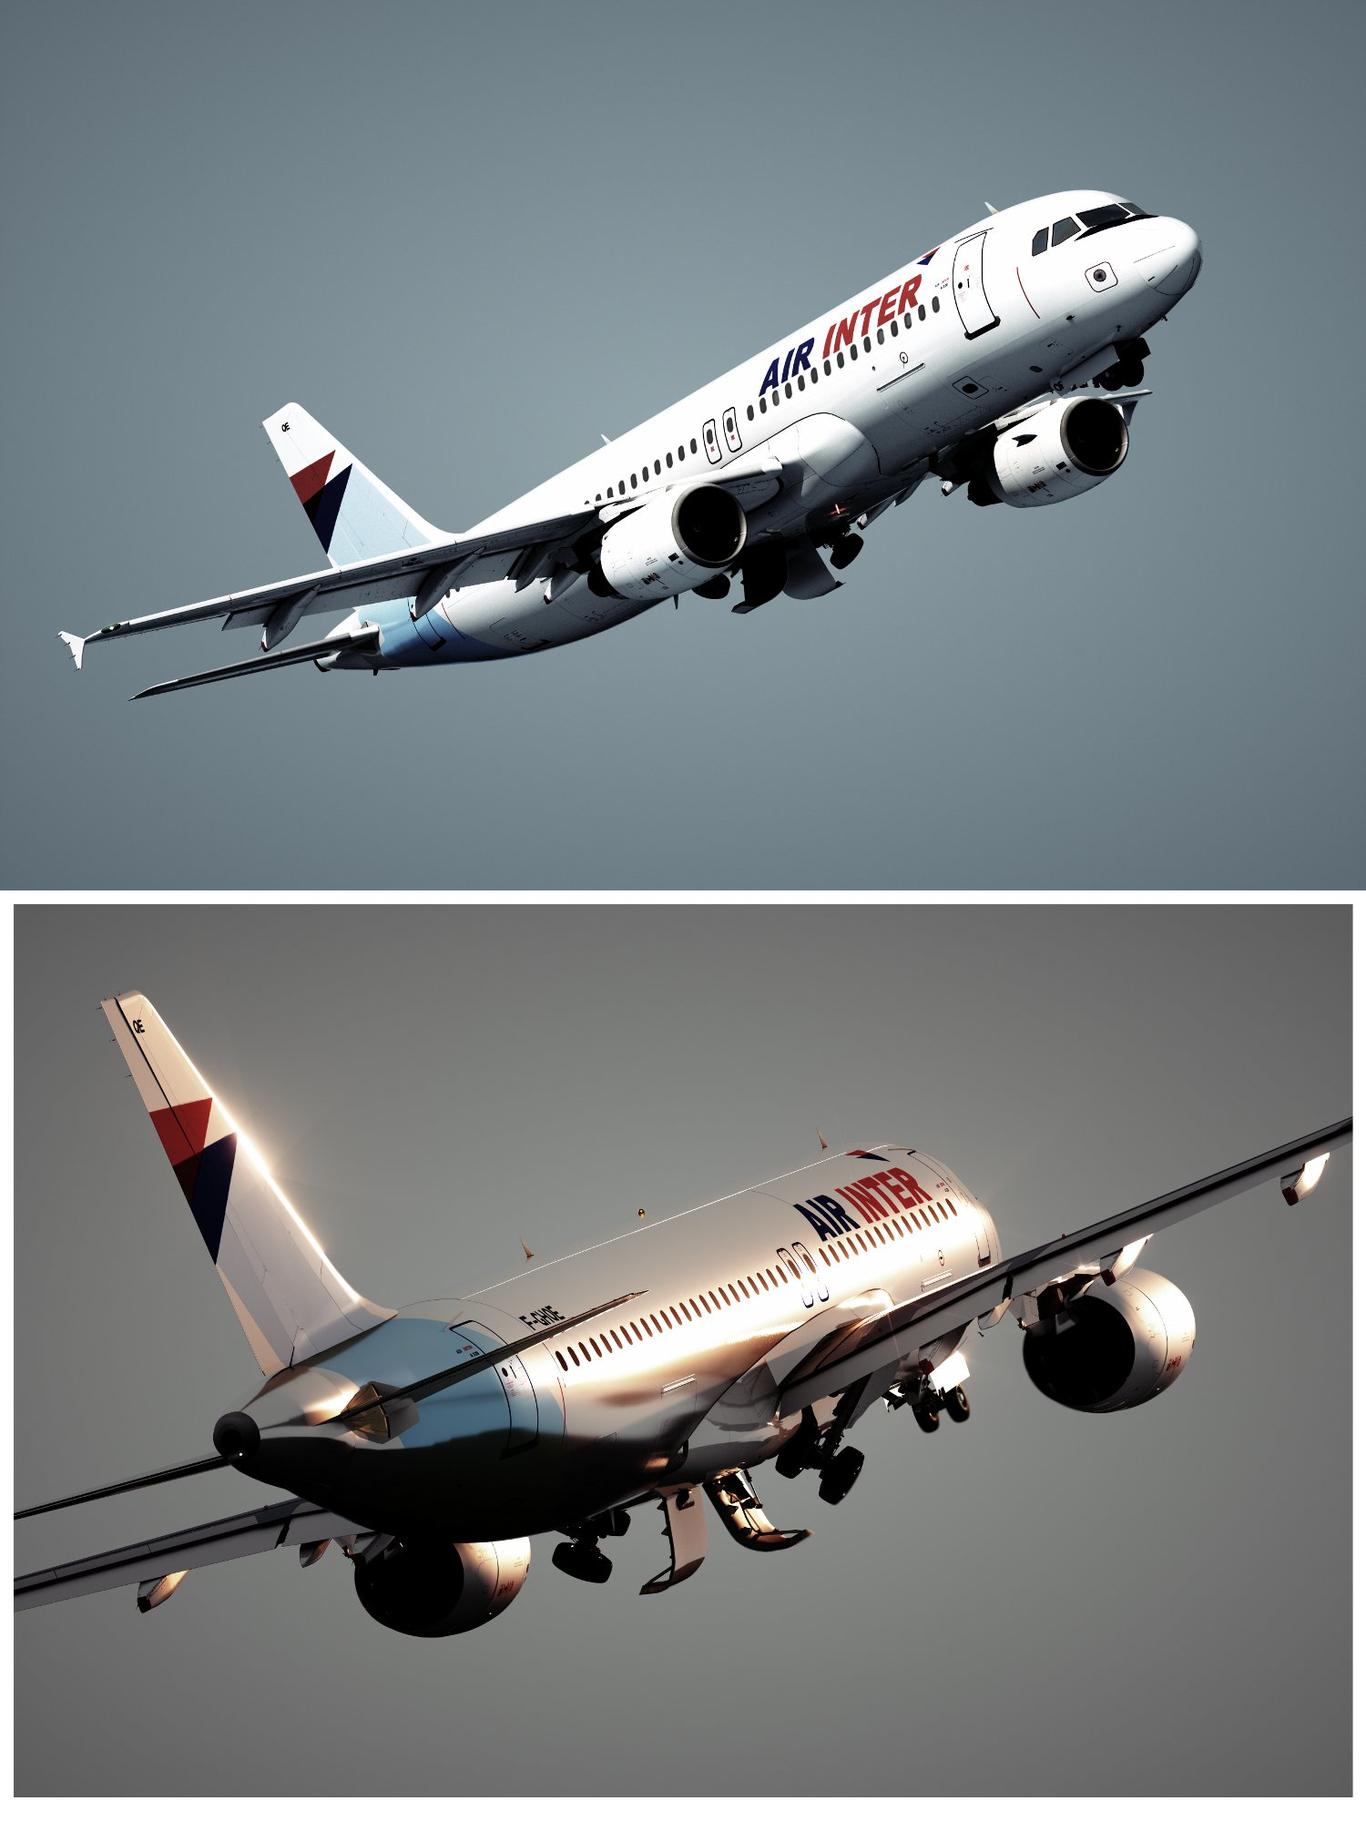 Amateur air inter a320 1 b972c157 odld